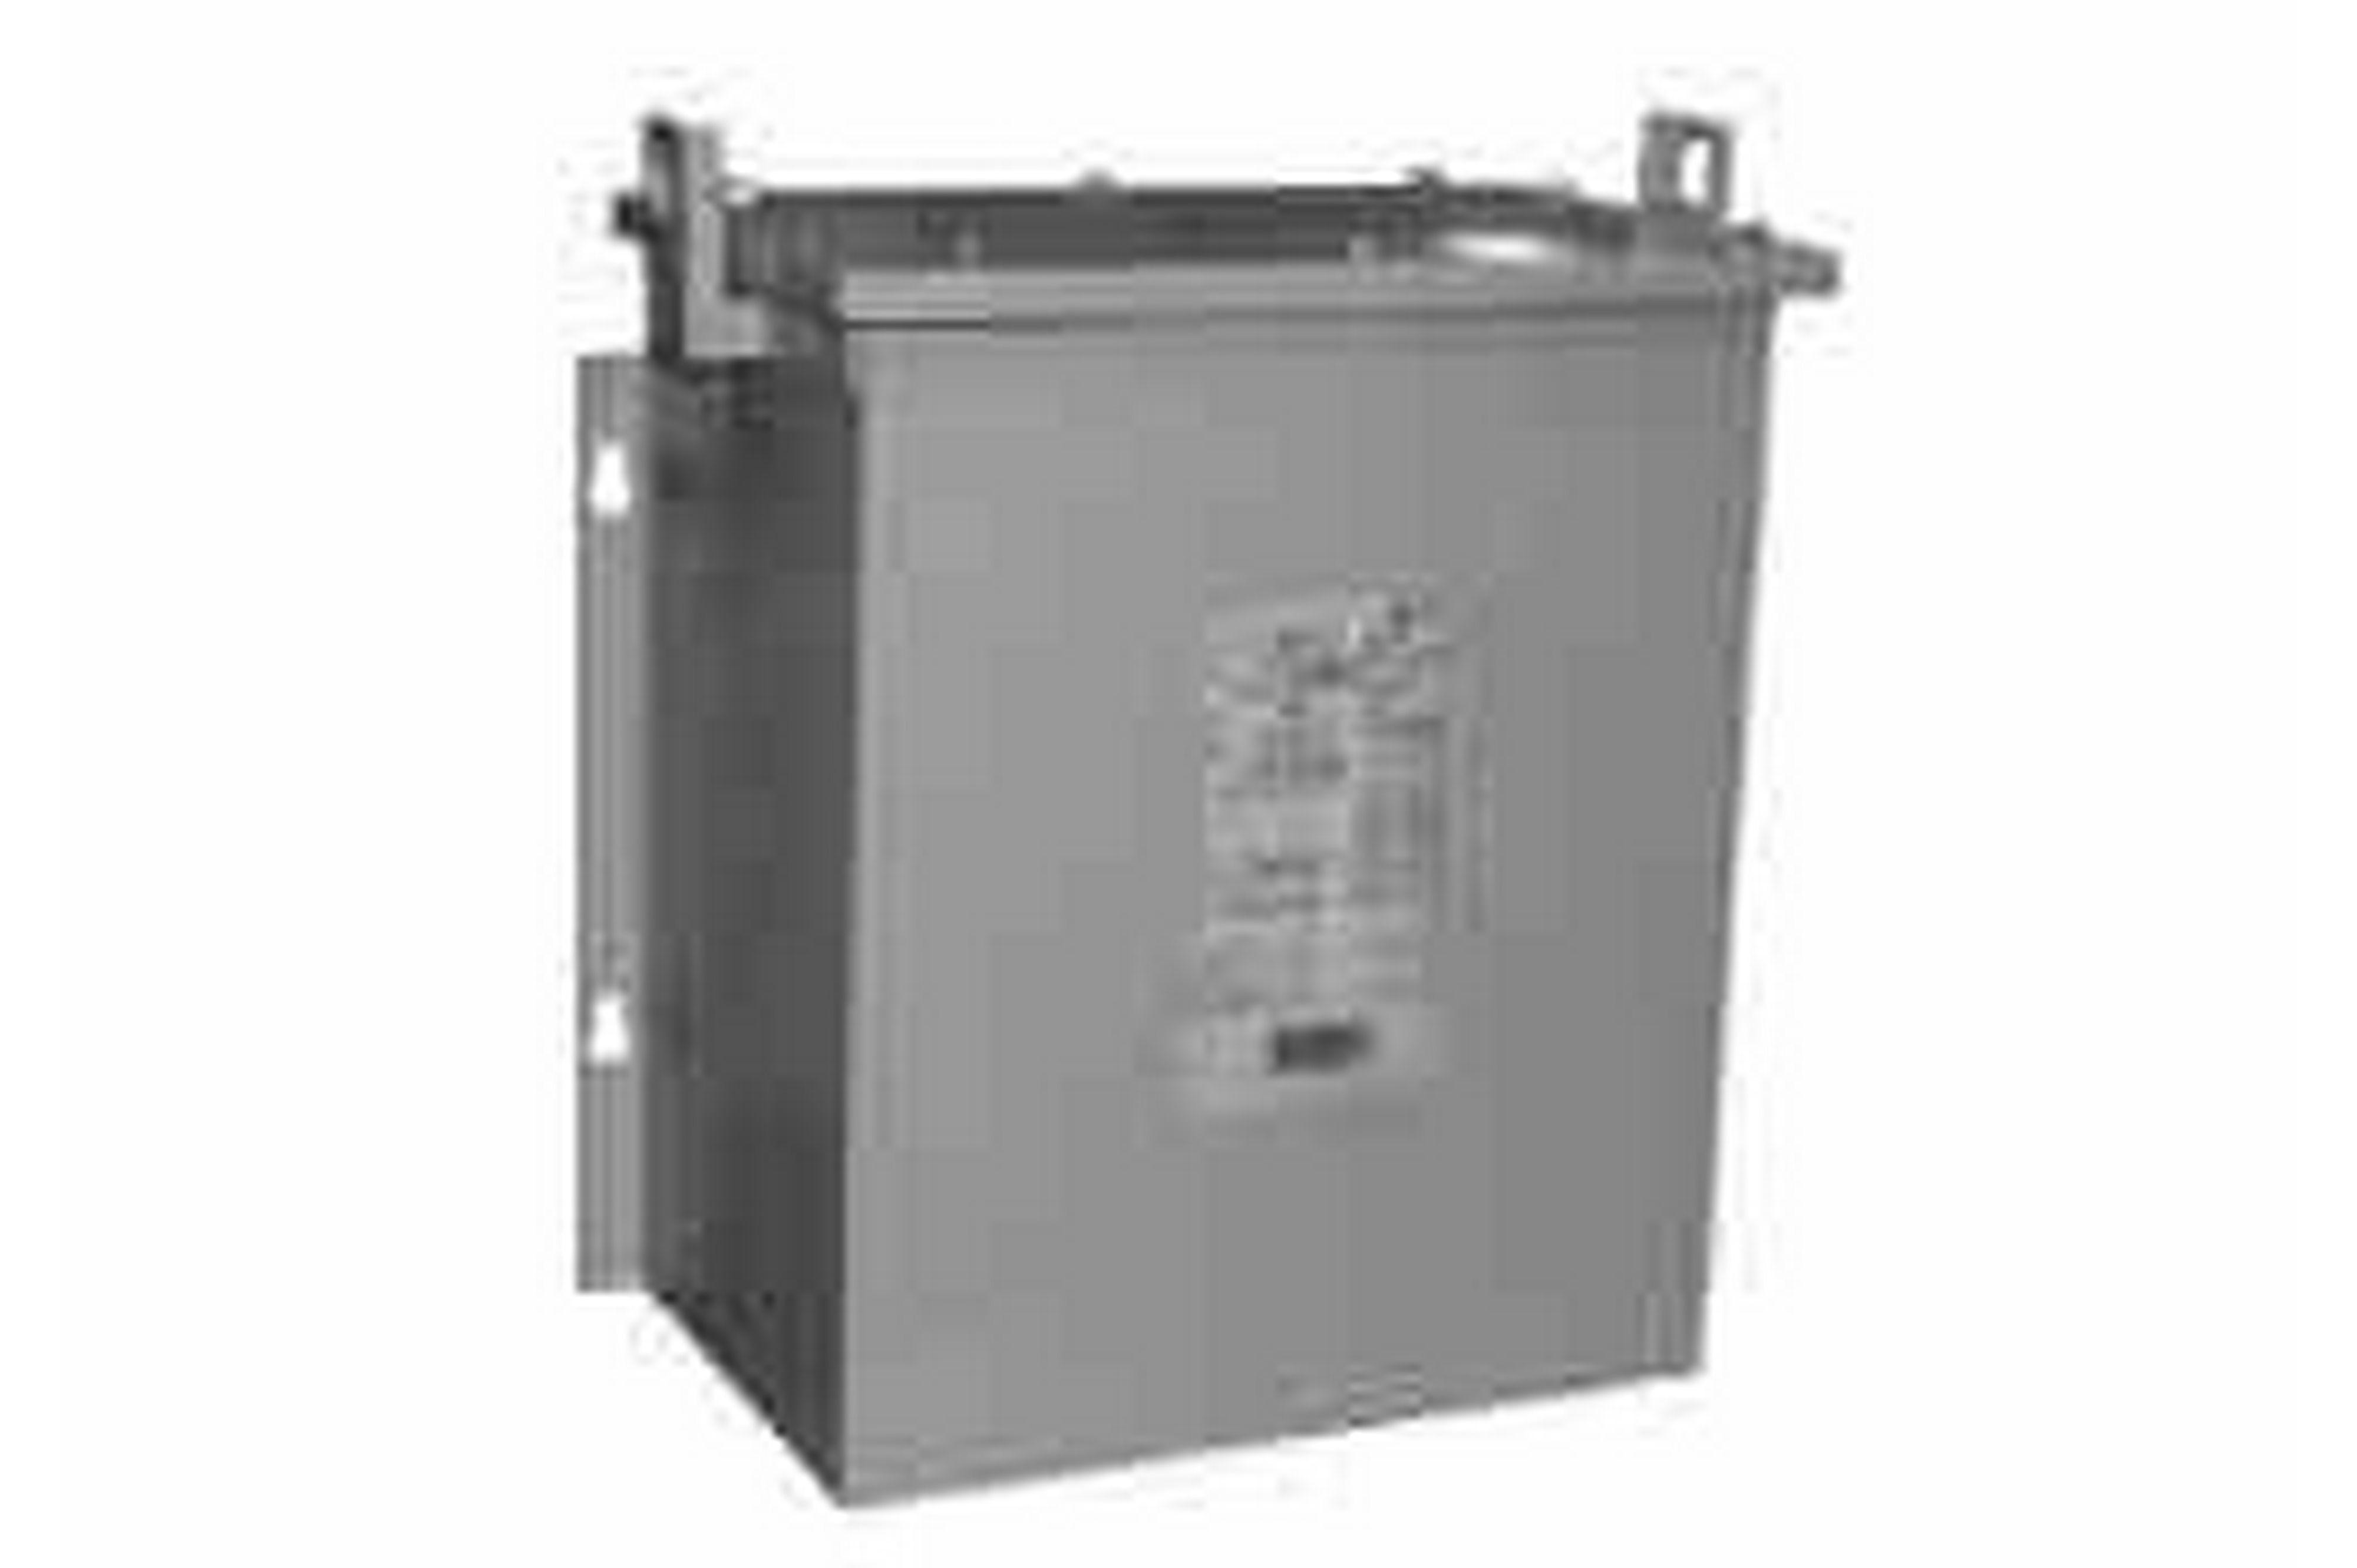 3kva Industrial Transformer 480v Delta Primary 120 240v 480 Wiring Diagram In Stock Yes